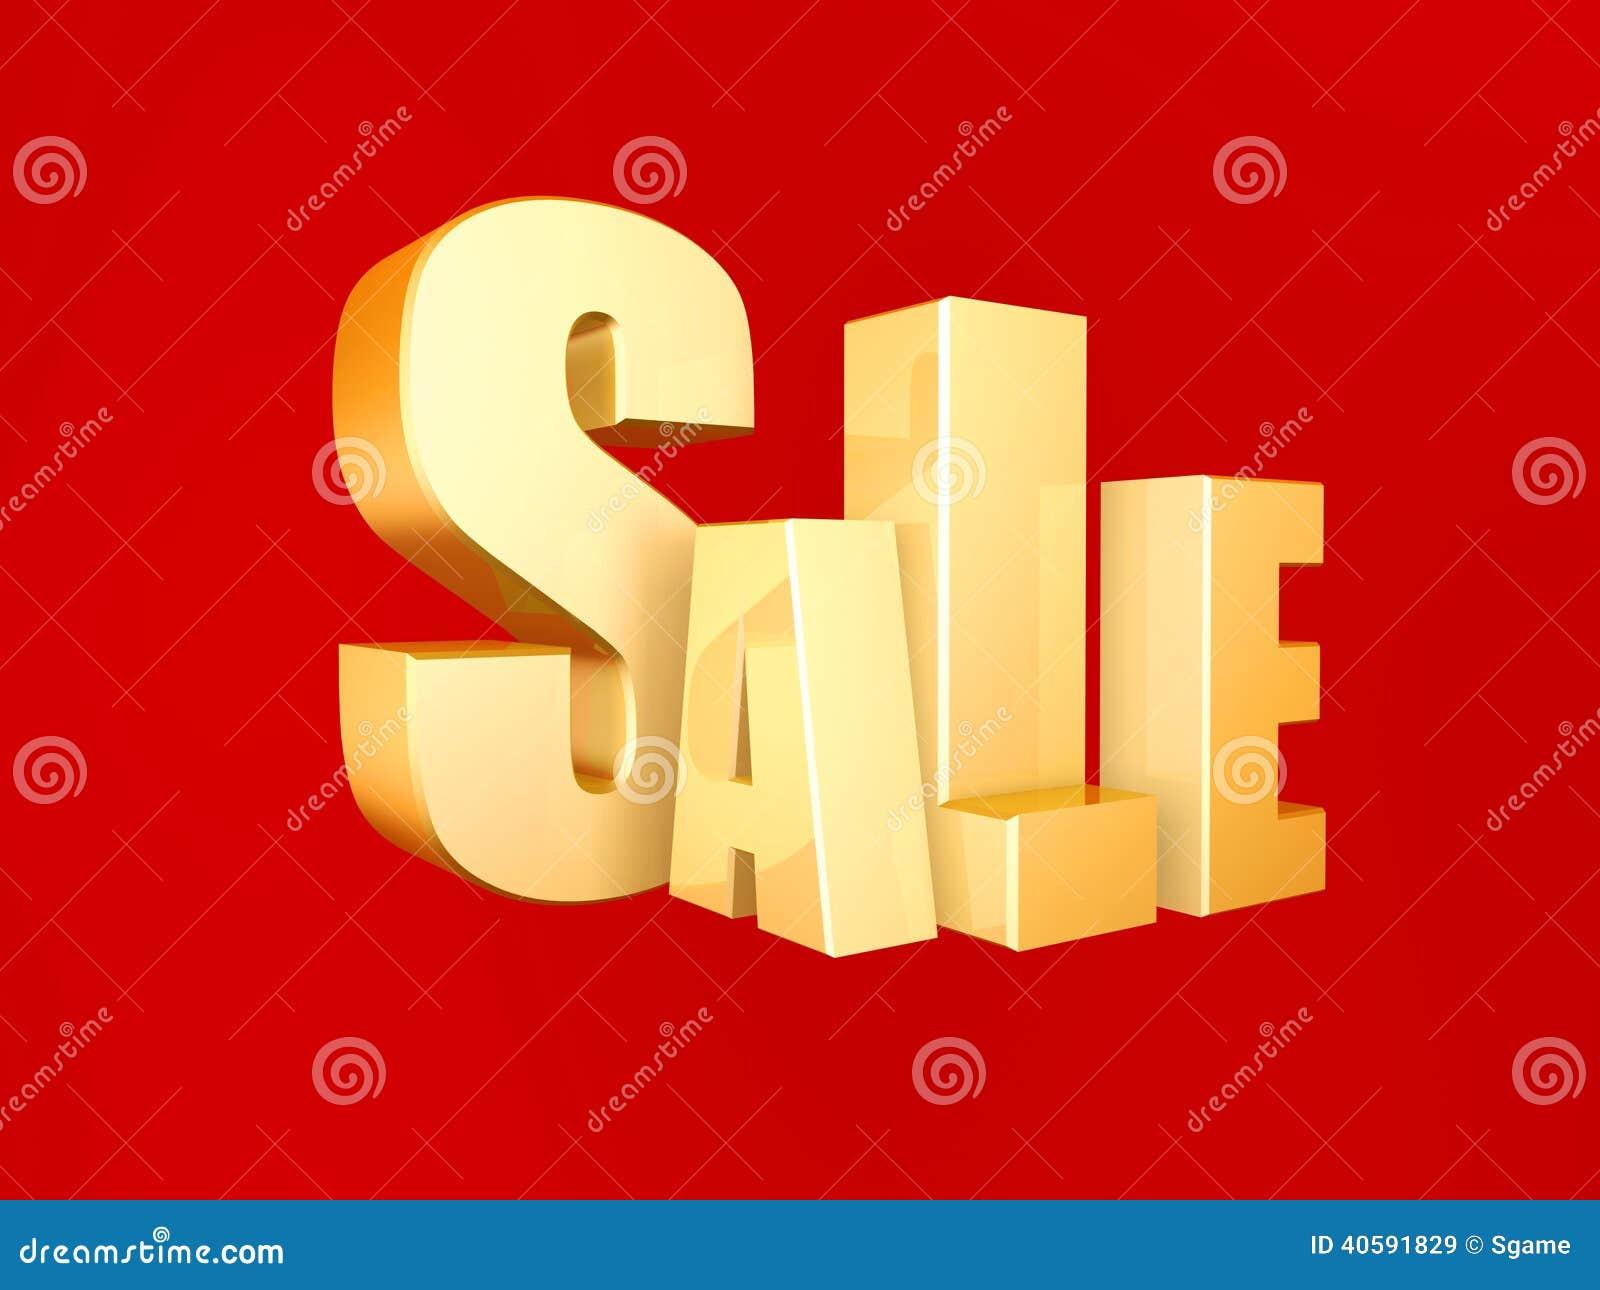 символ продажи 3d